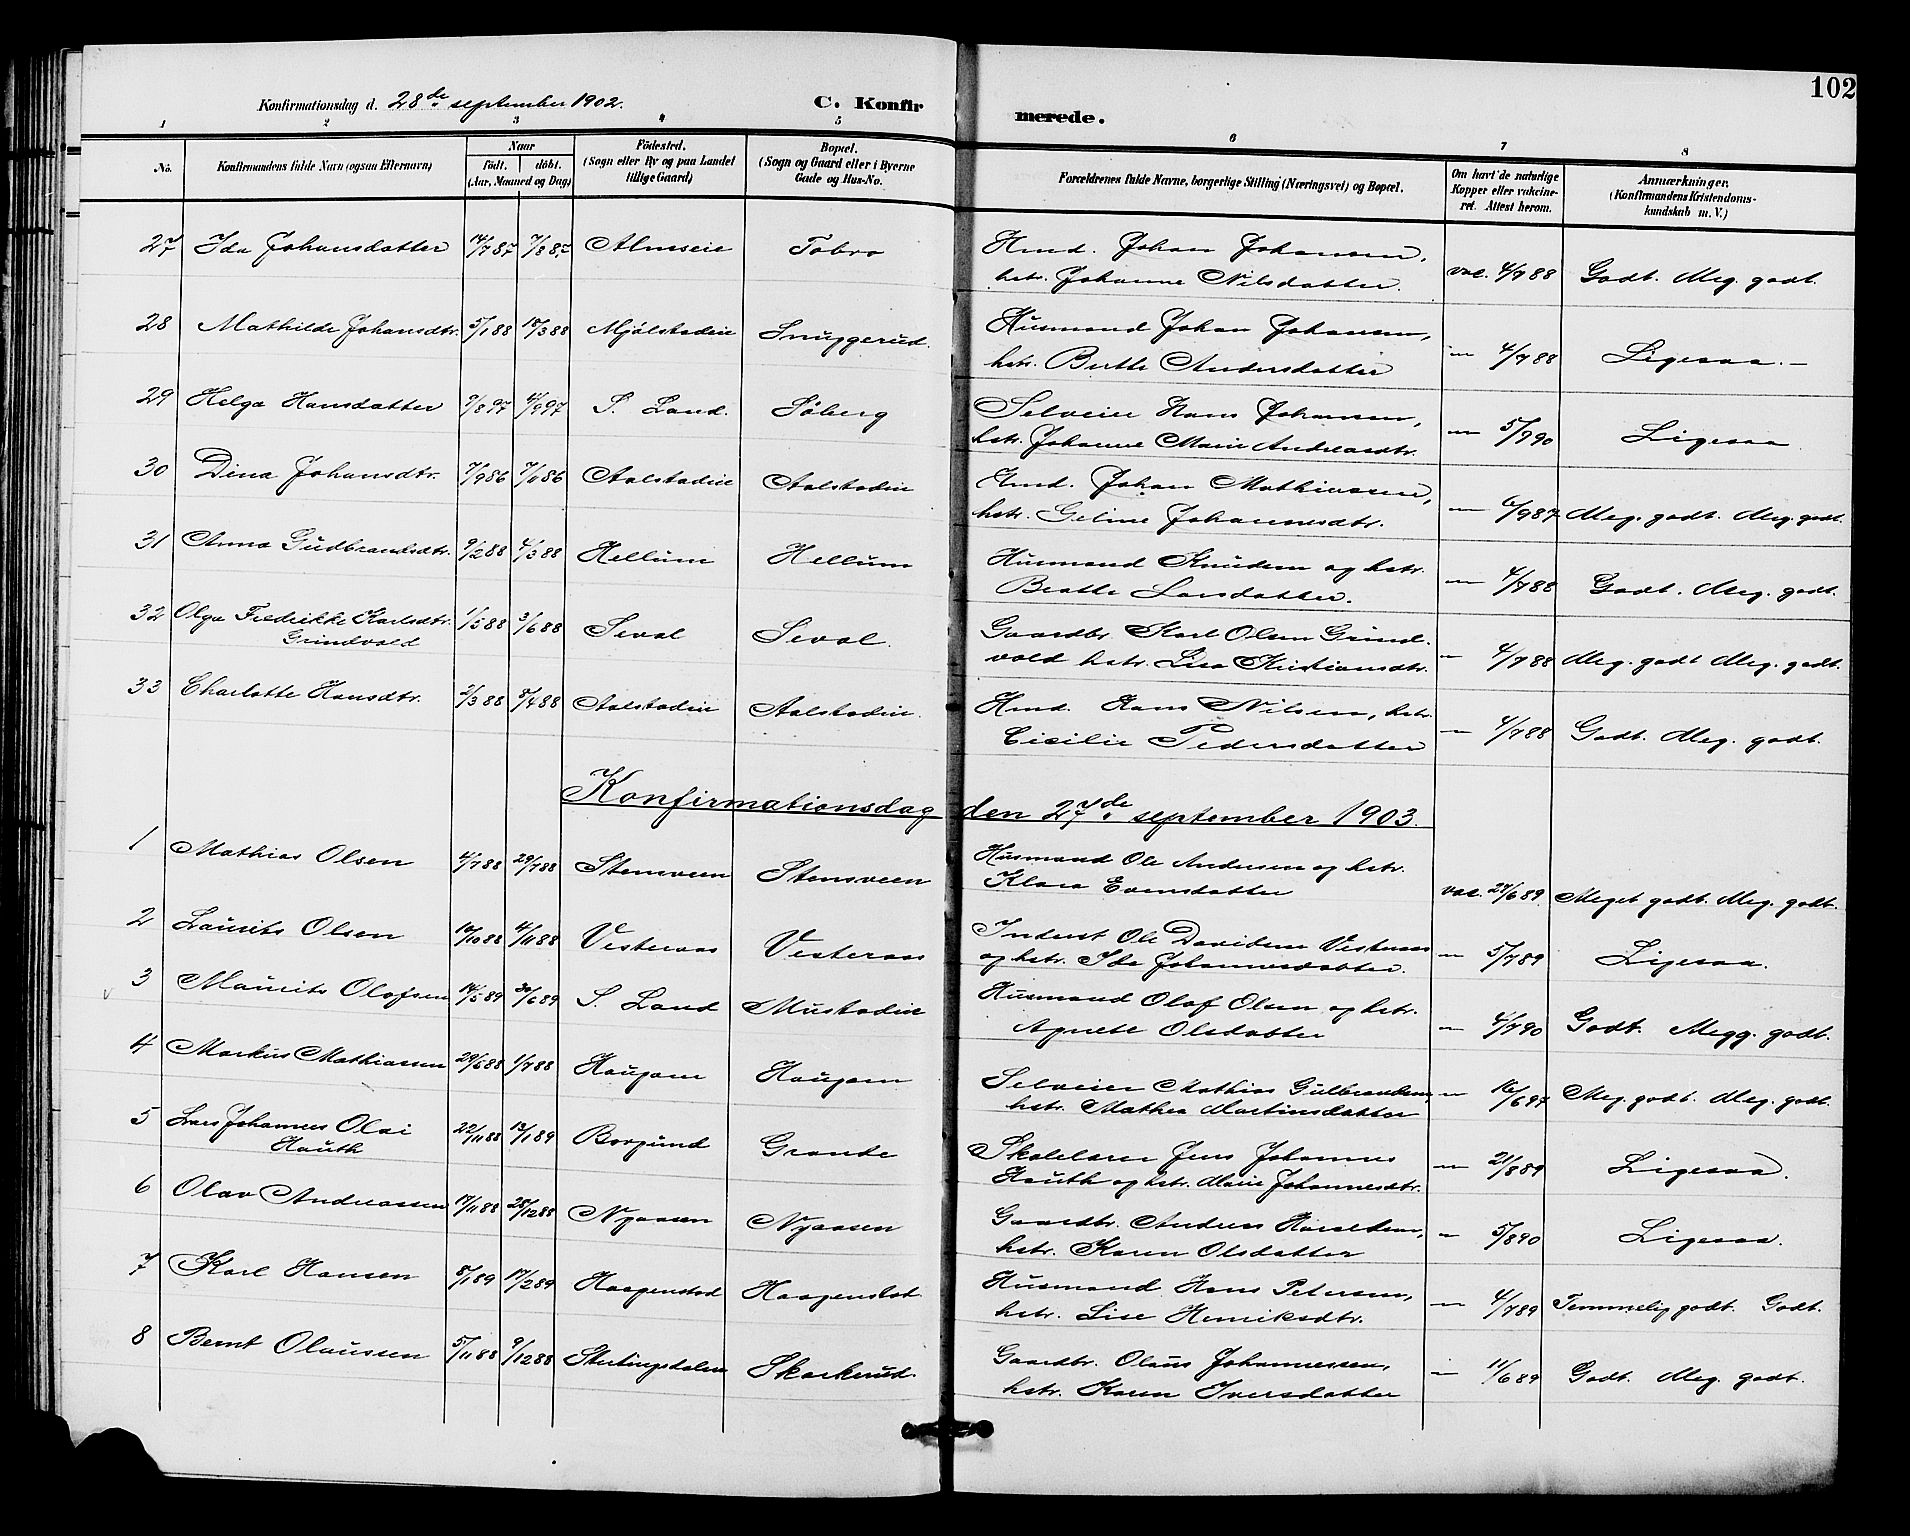 SAH, Vardal prestekontor, H/Ha/Hab/L0011: Klokkerbok nr. 11, 1899-1913, s. 102